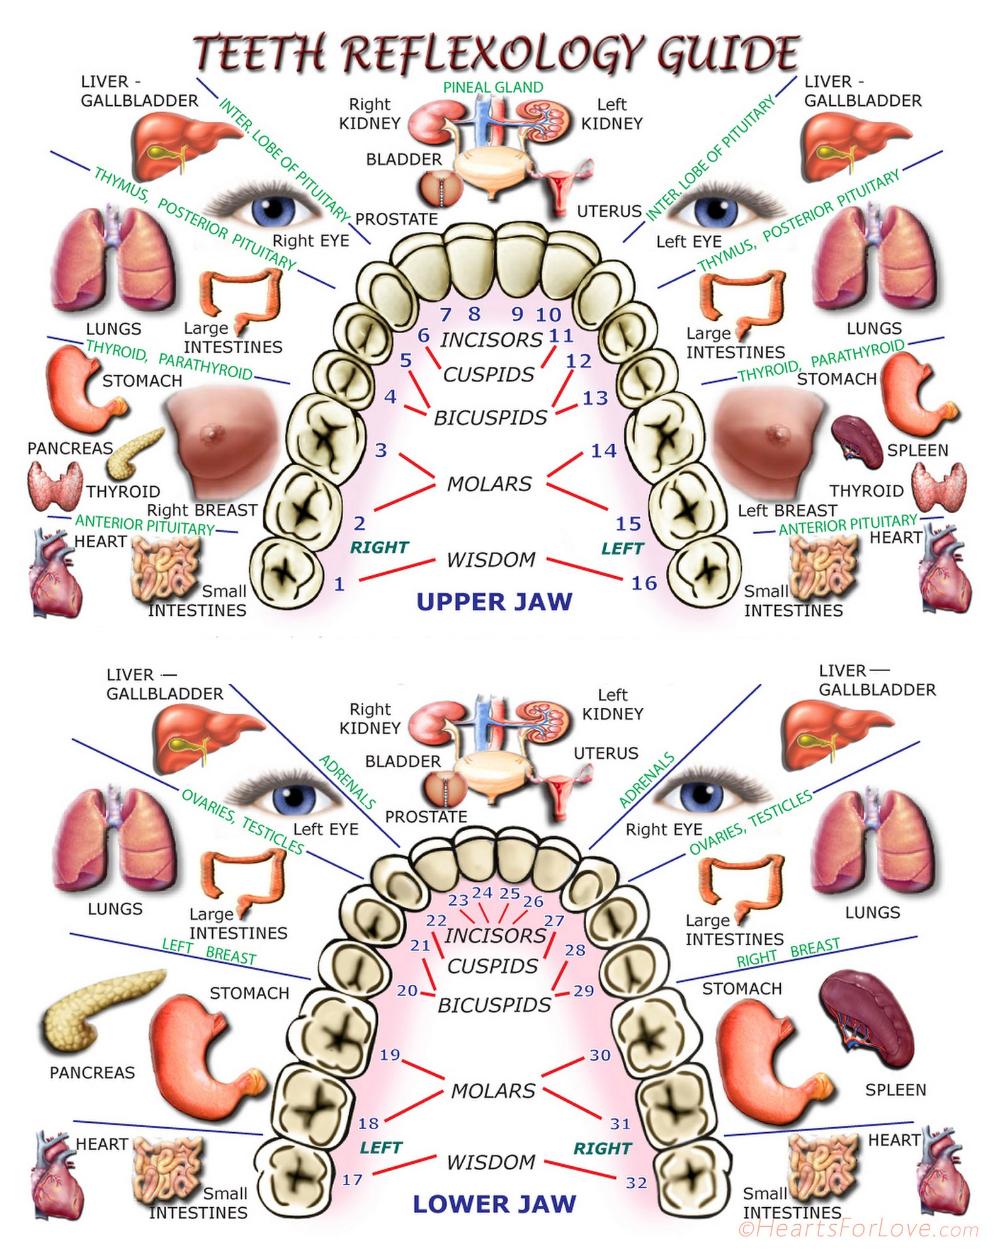 Teeth Reflexology Guide, Print, 8x10